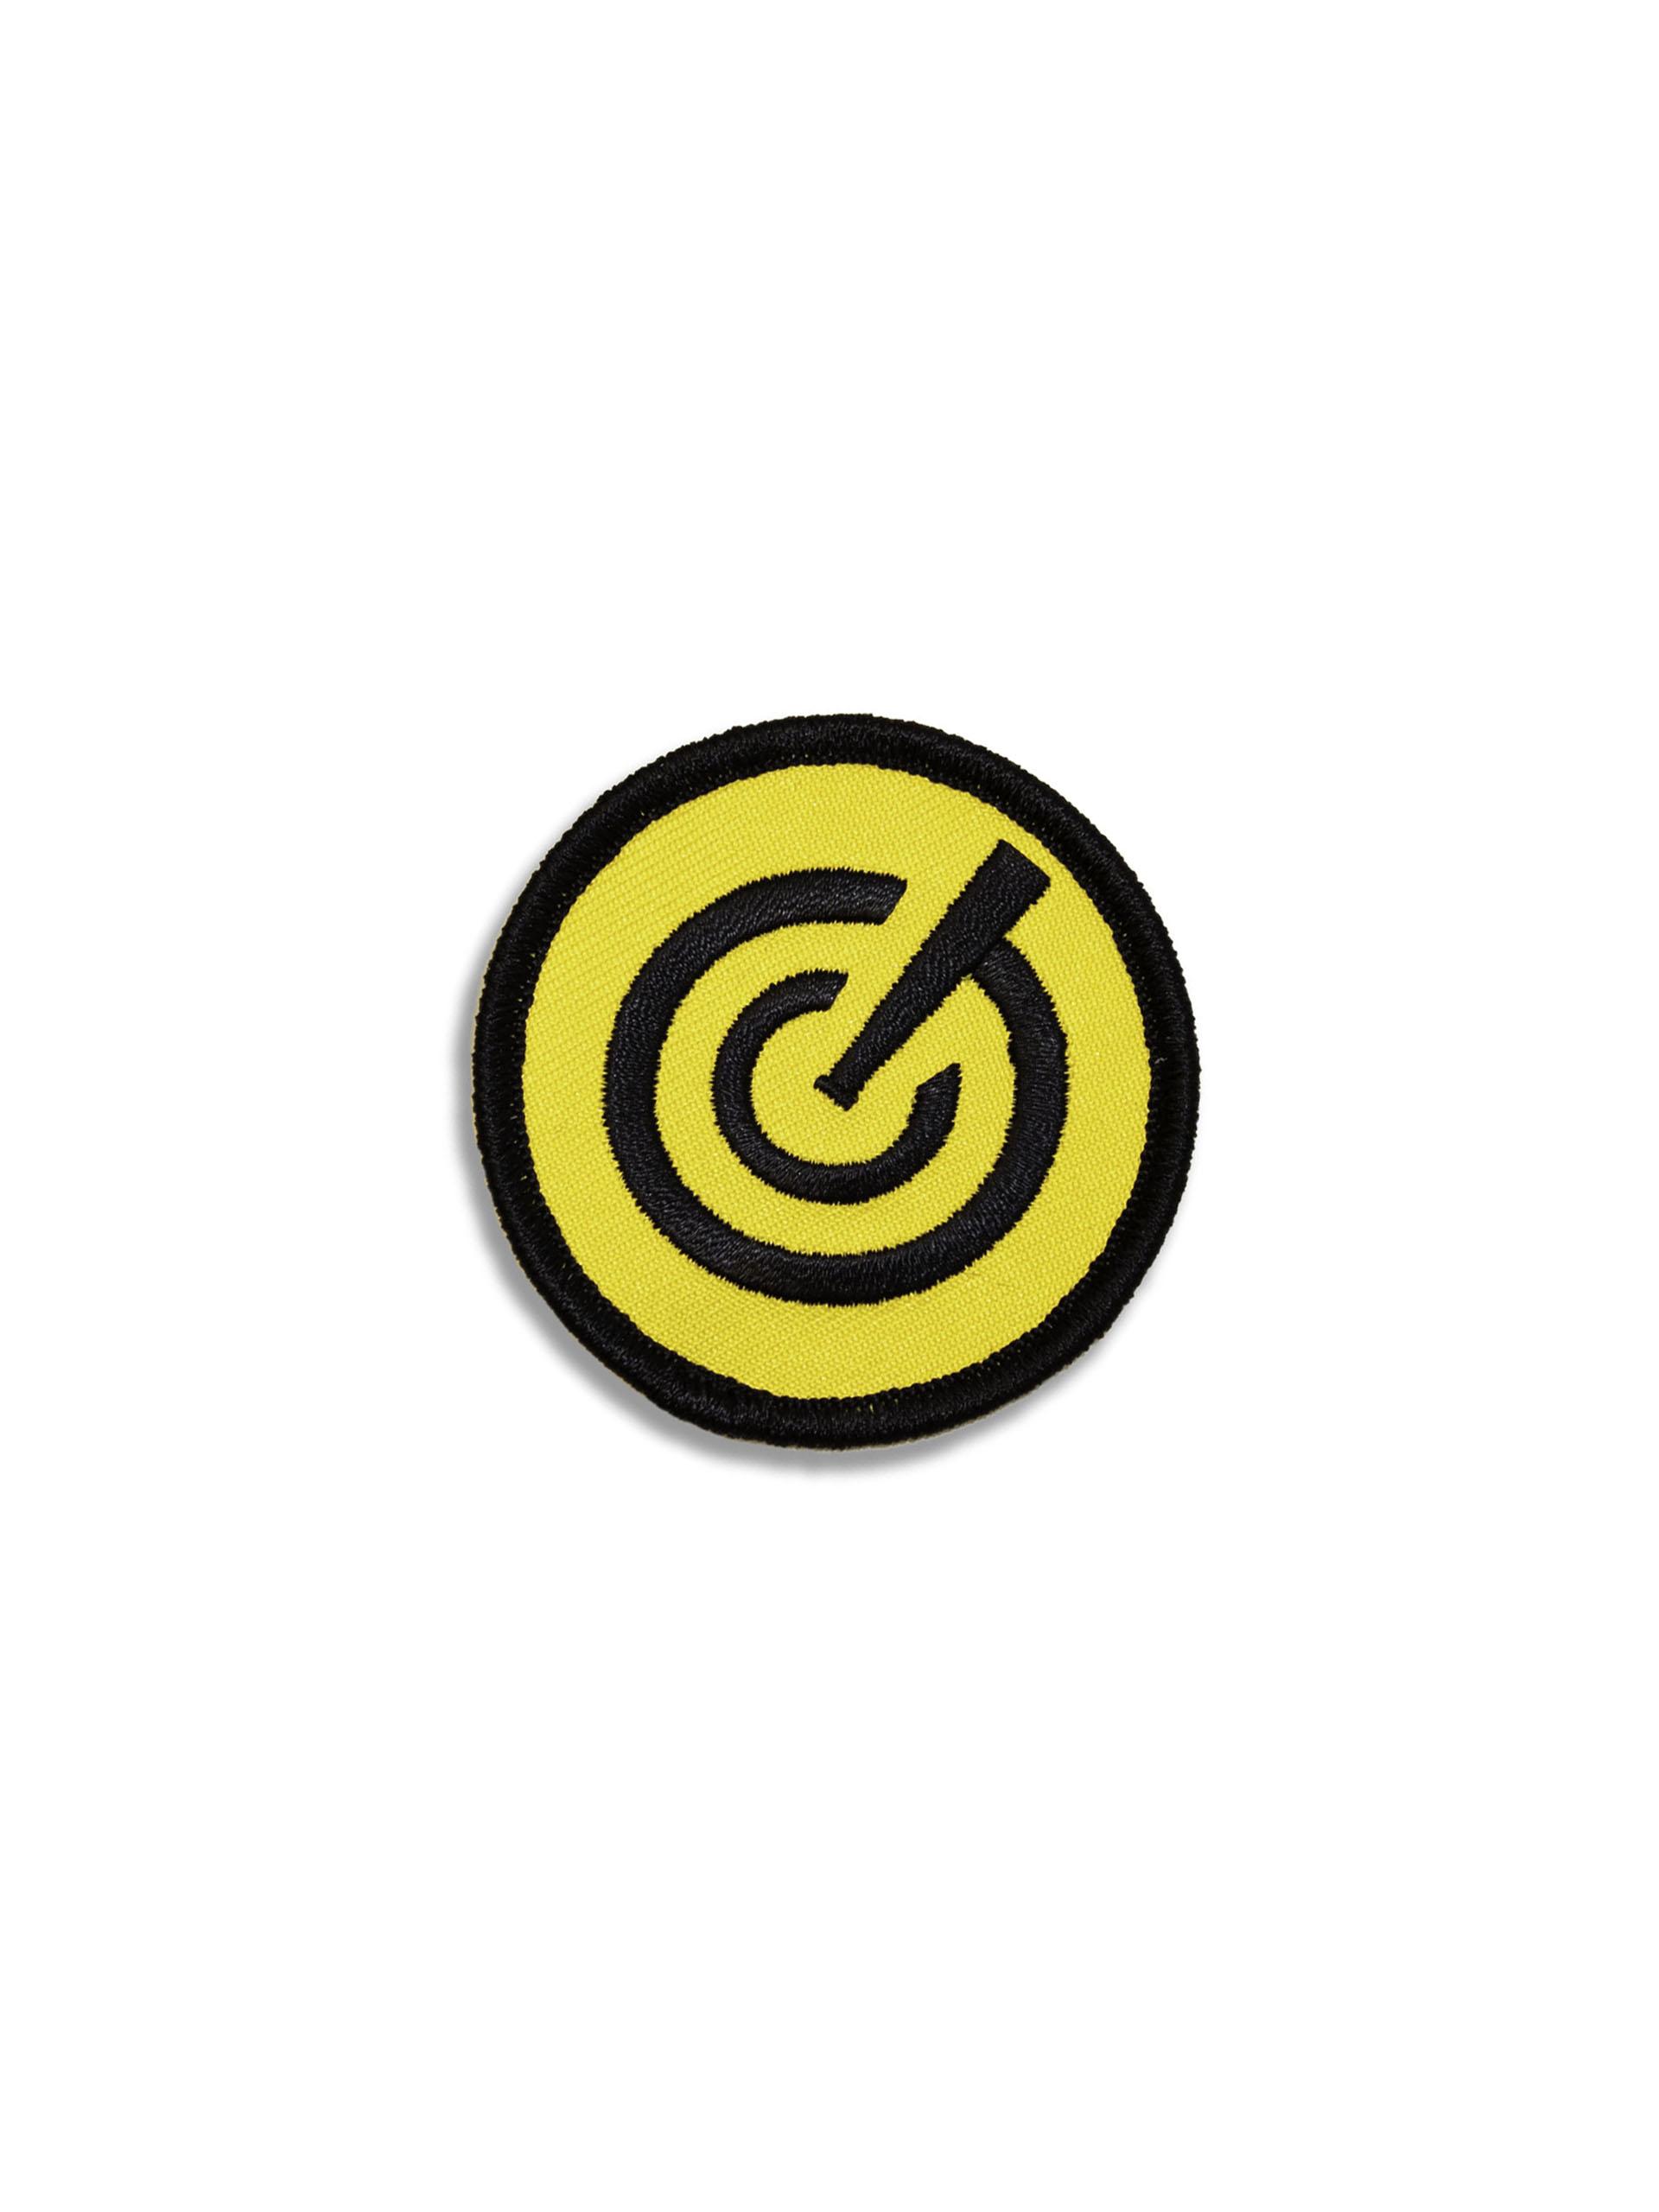 GC Circle Icon Patch